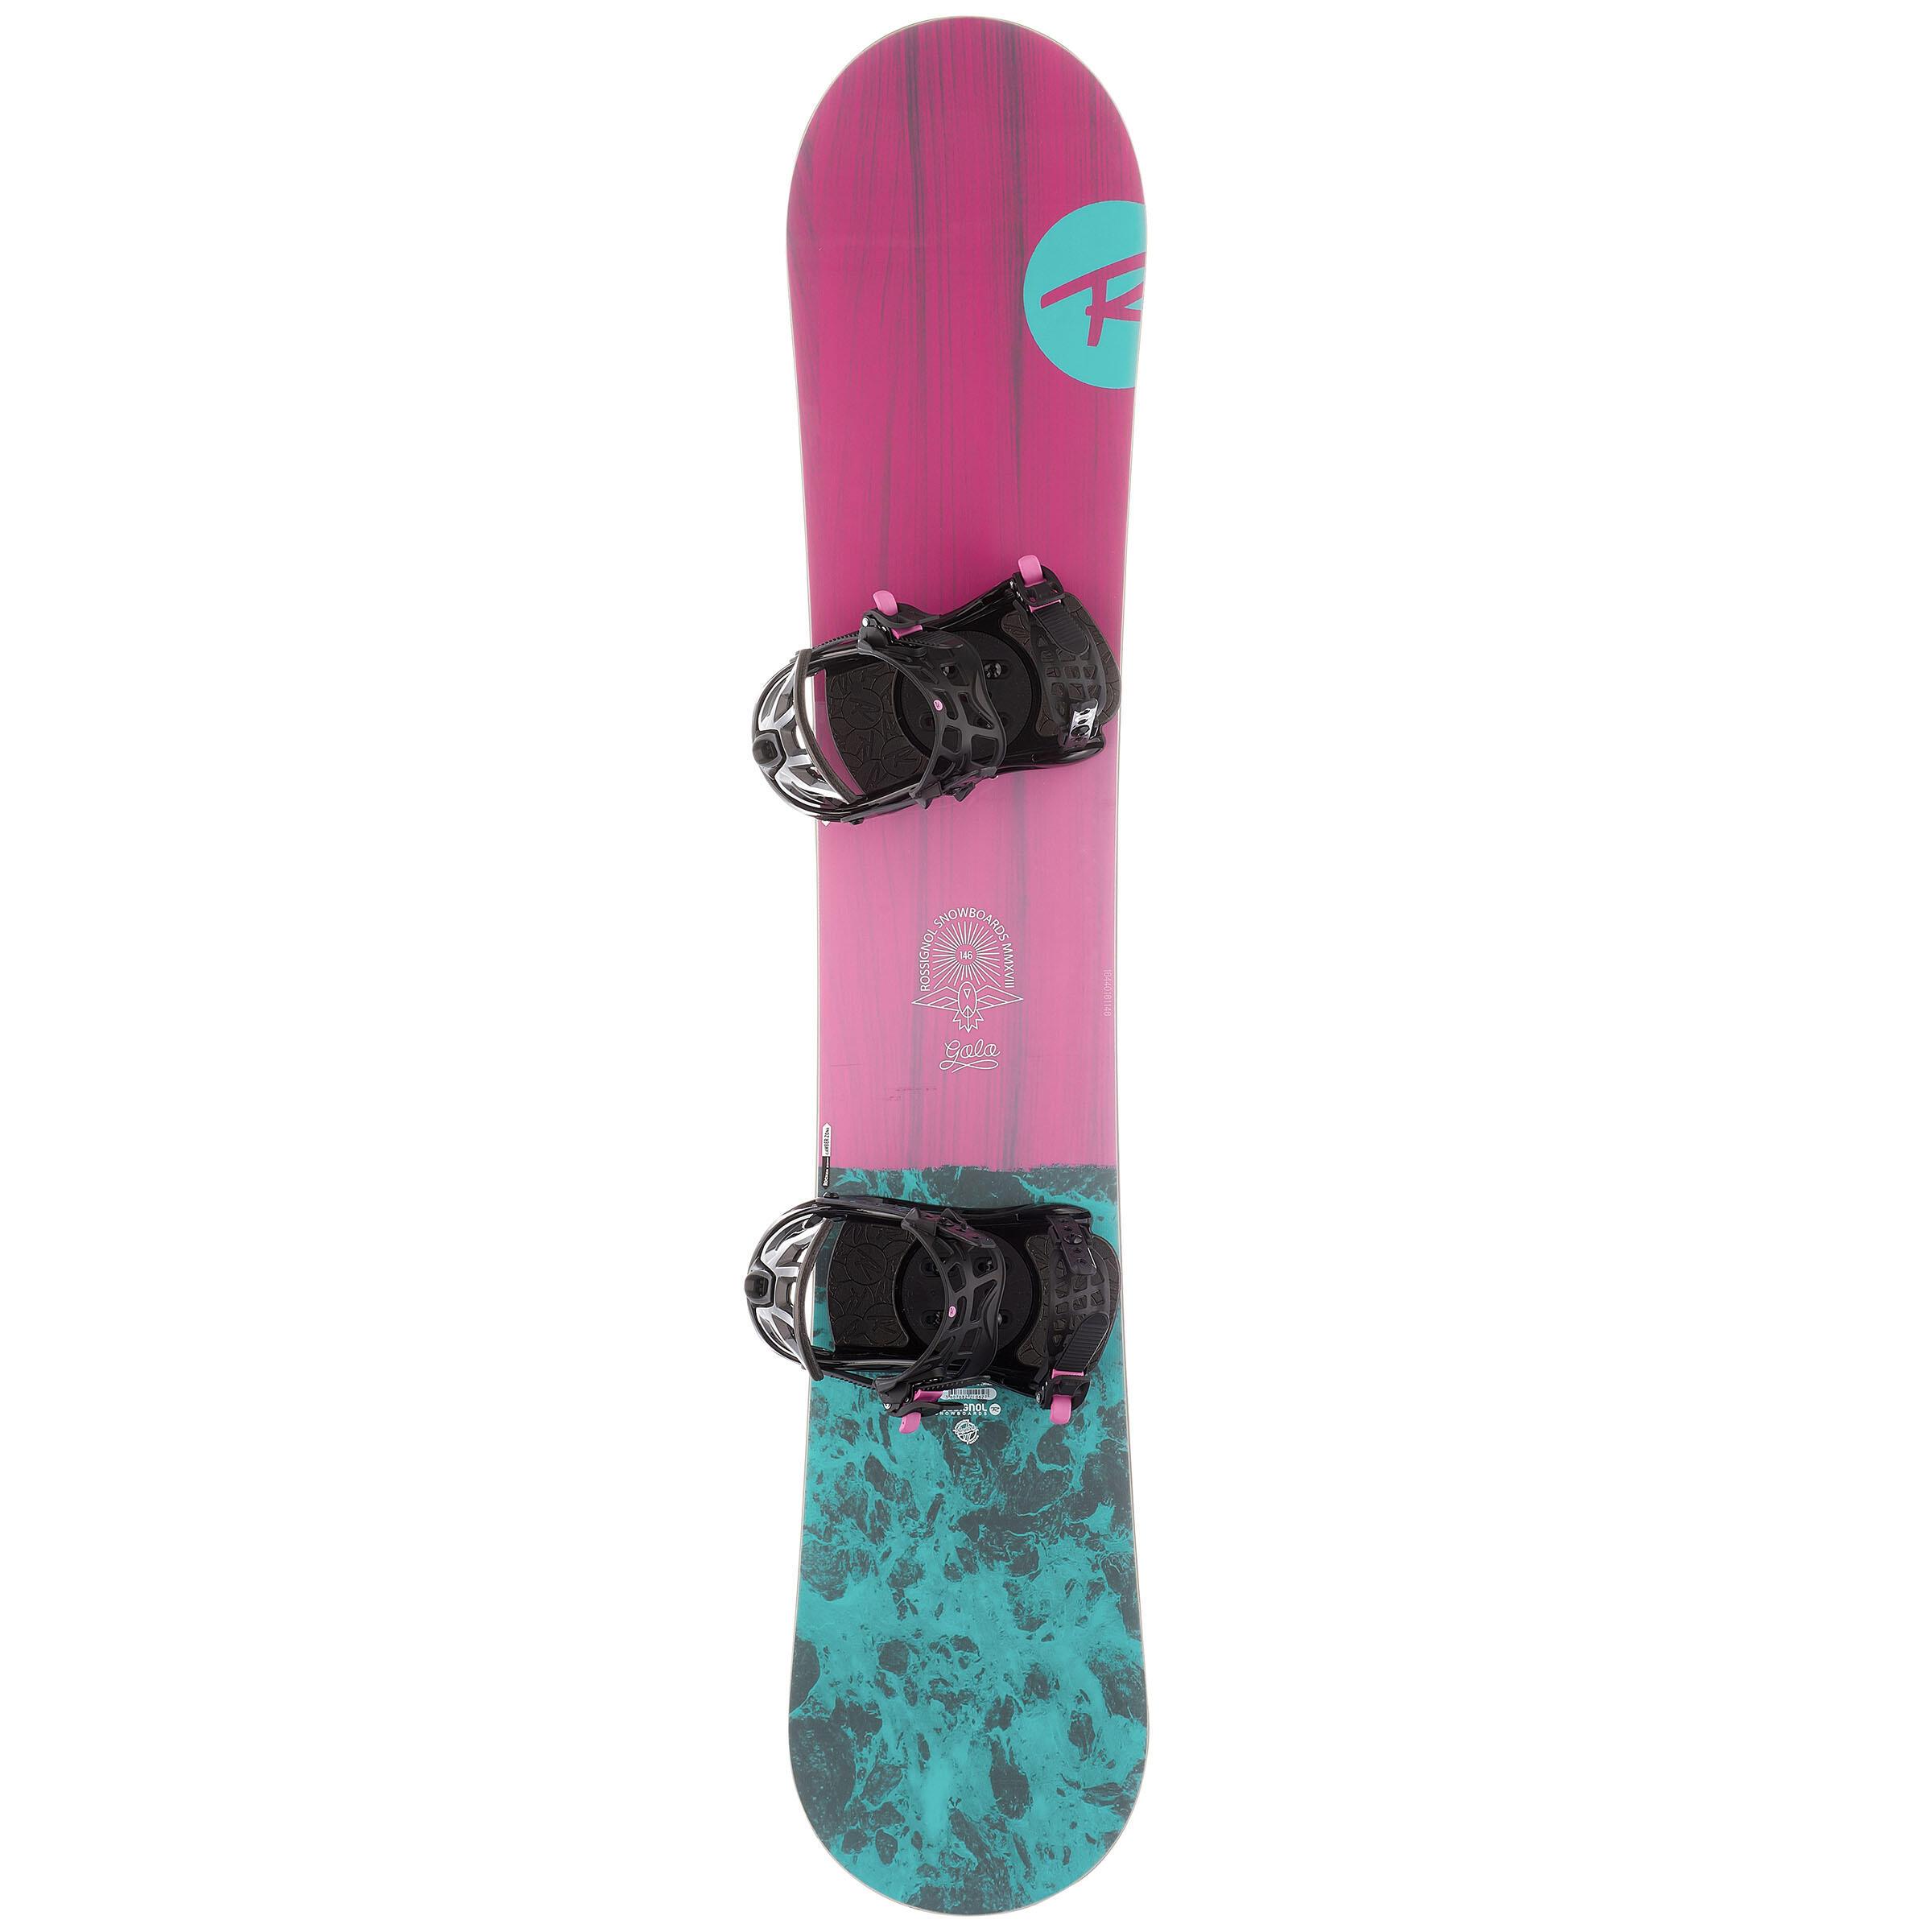 Rossignol Snowboardset All Mountain dames Gala roze/blauw thumbnail